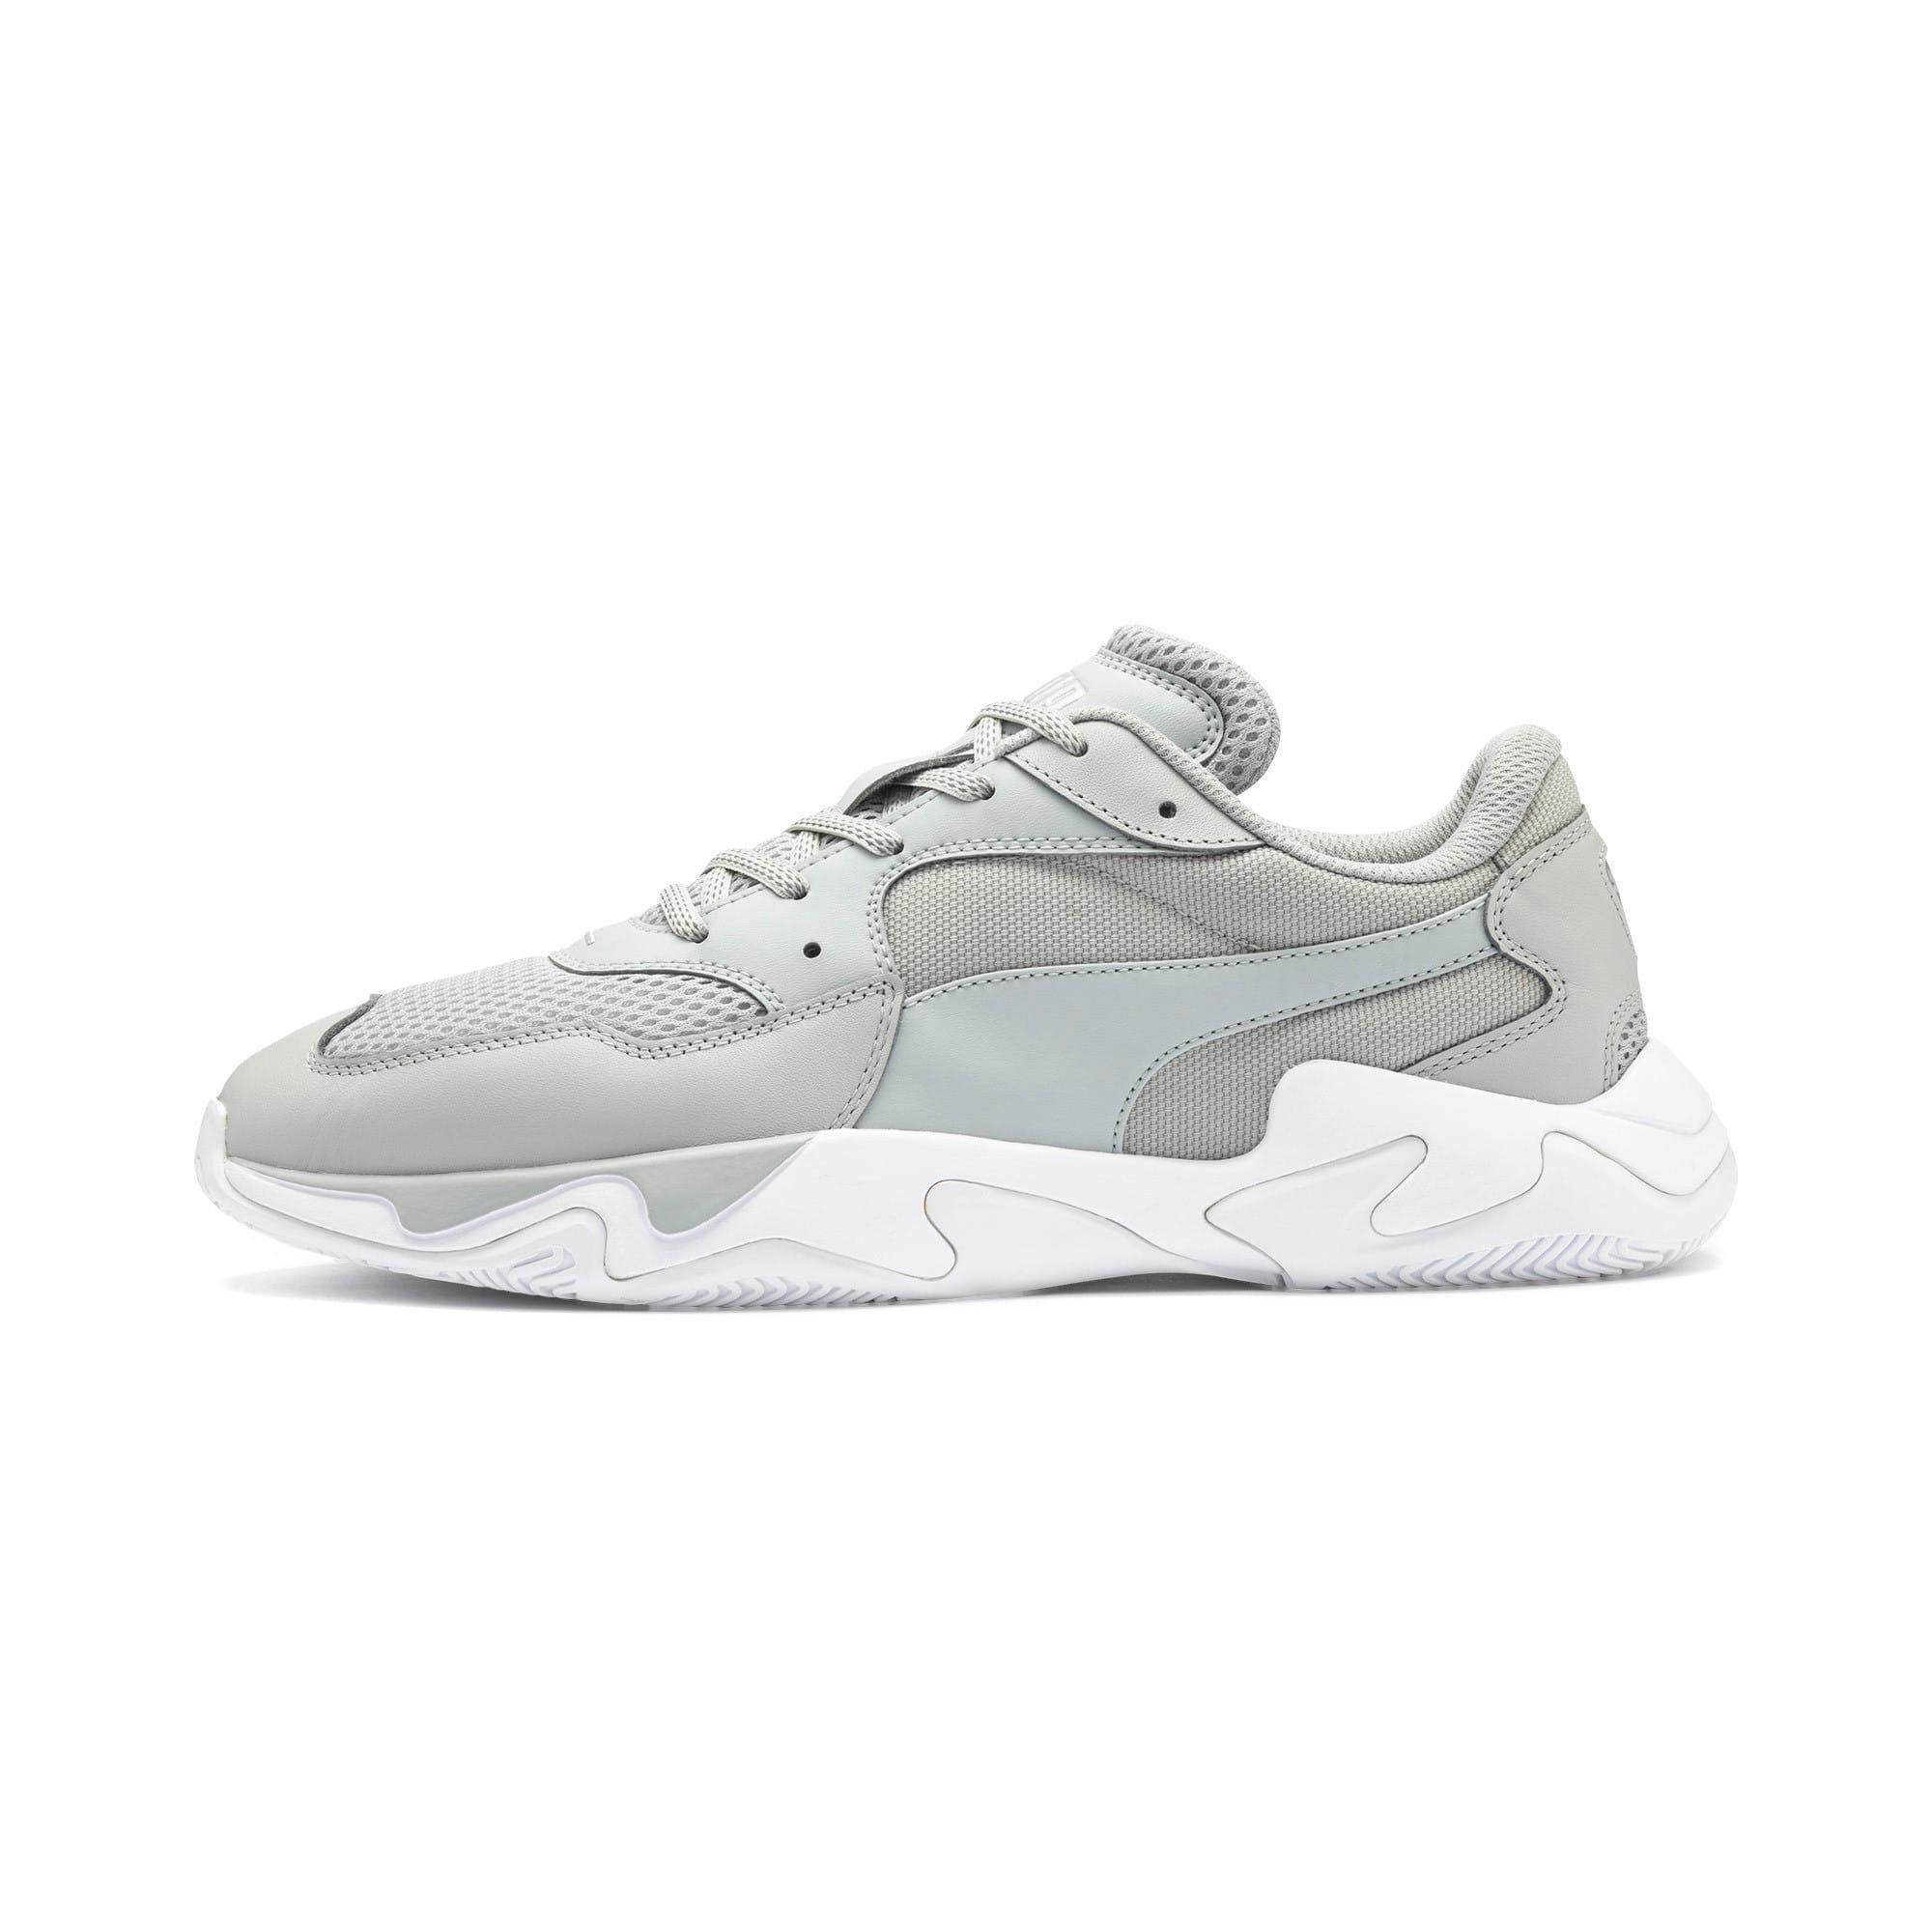 Miniatura 1 de Zapatos deportivos Storm Pulse, High Rise, mediano